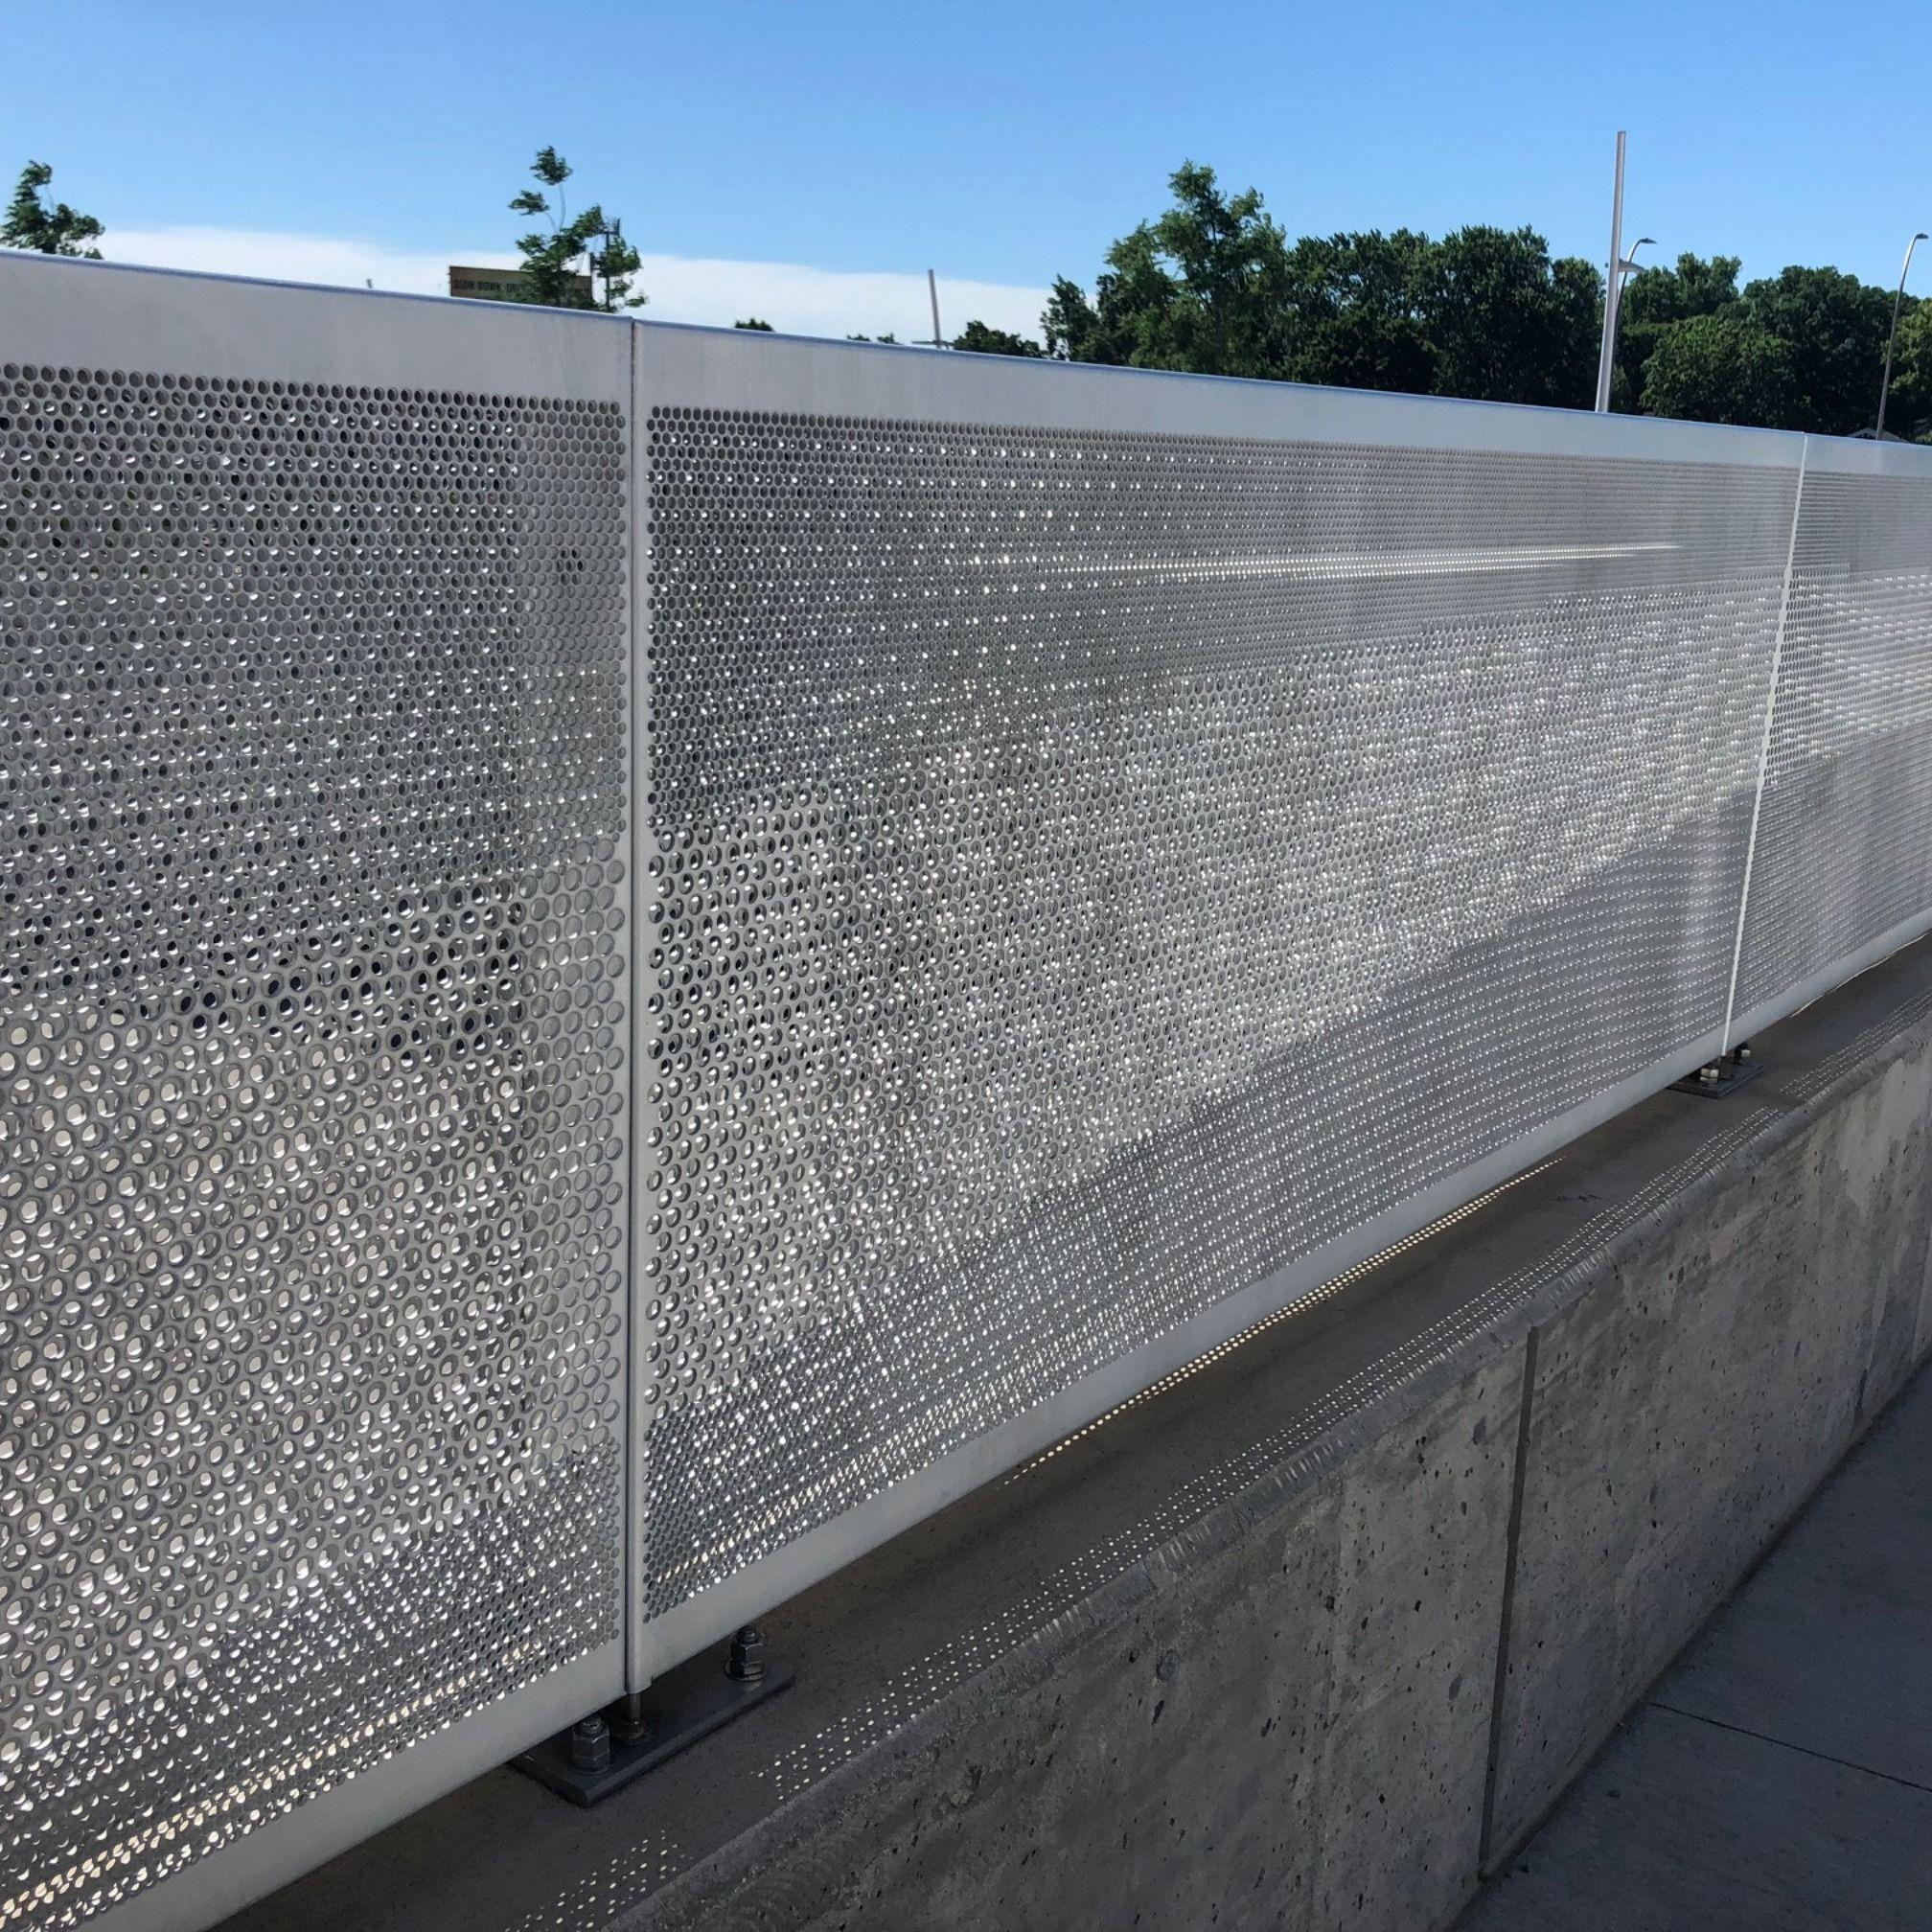 Altezza Dei Parapetti pin on perforated metal panels